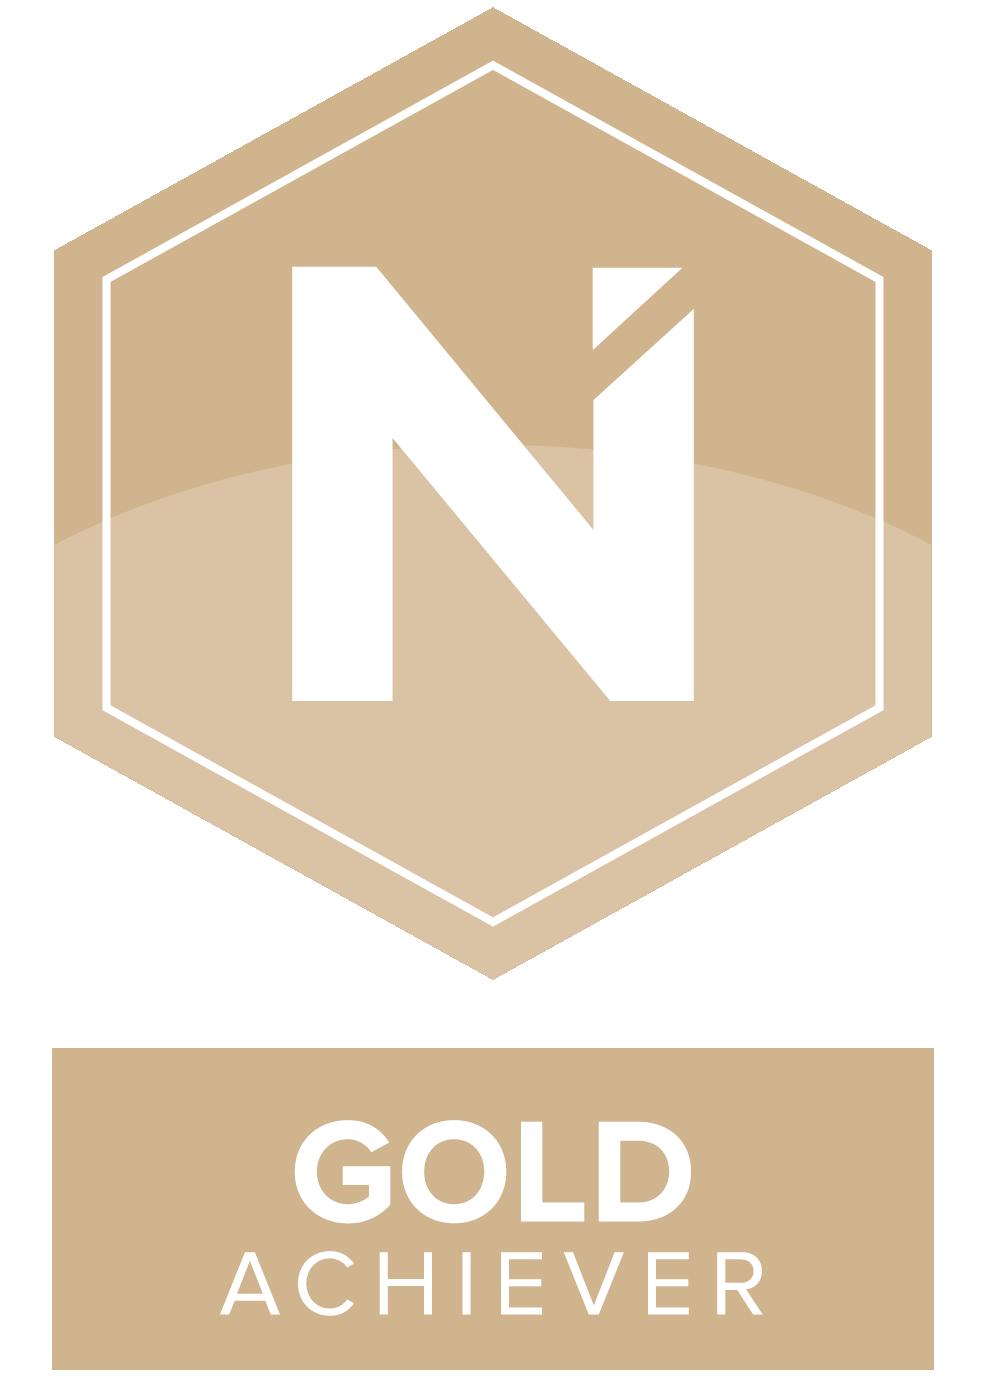 Nidd - Gold Achiever Icon